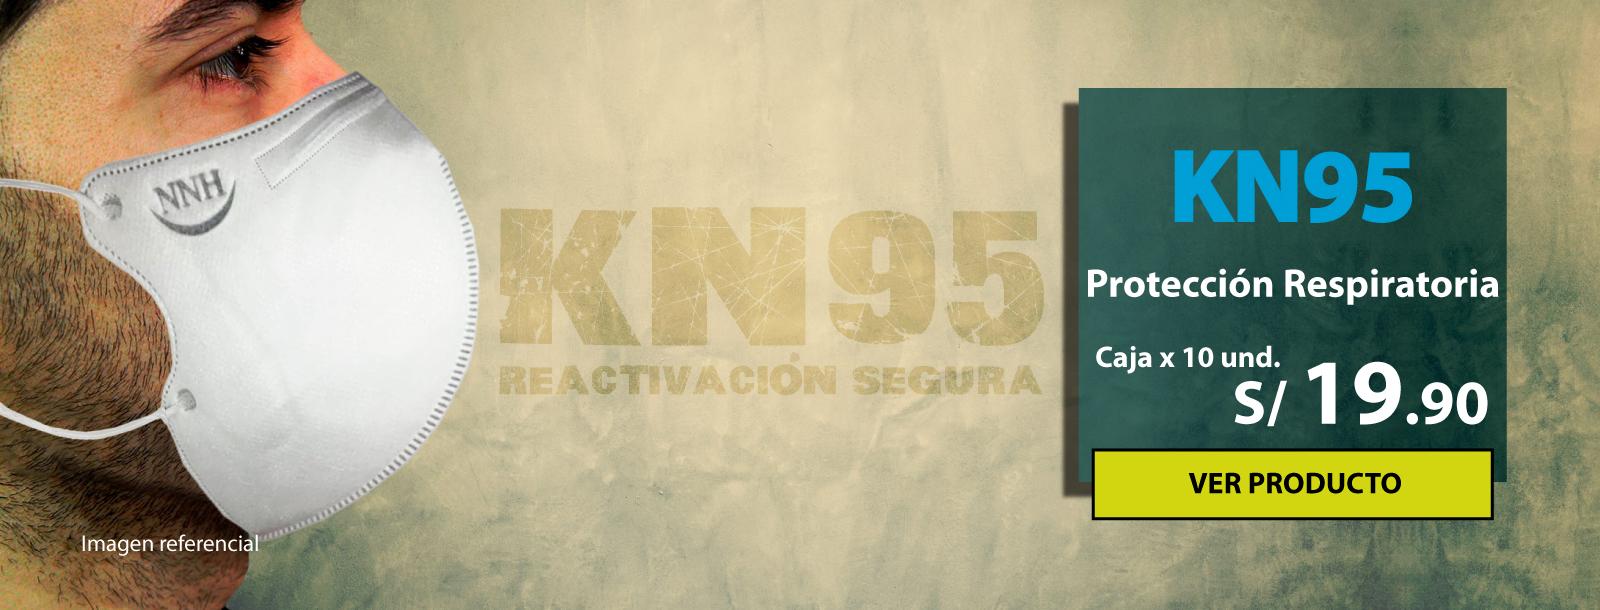 Kn95 17.07